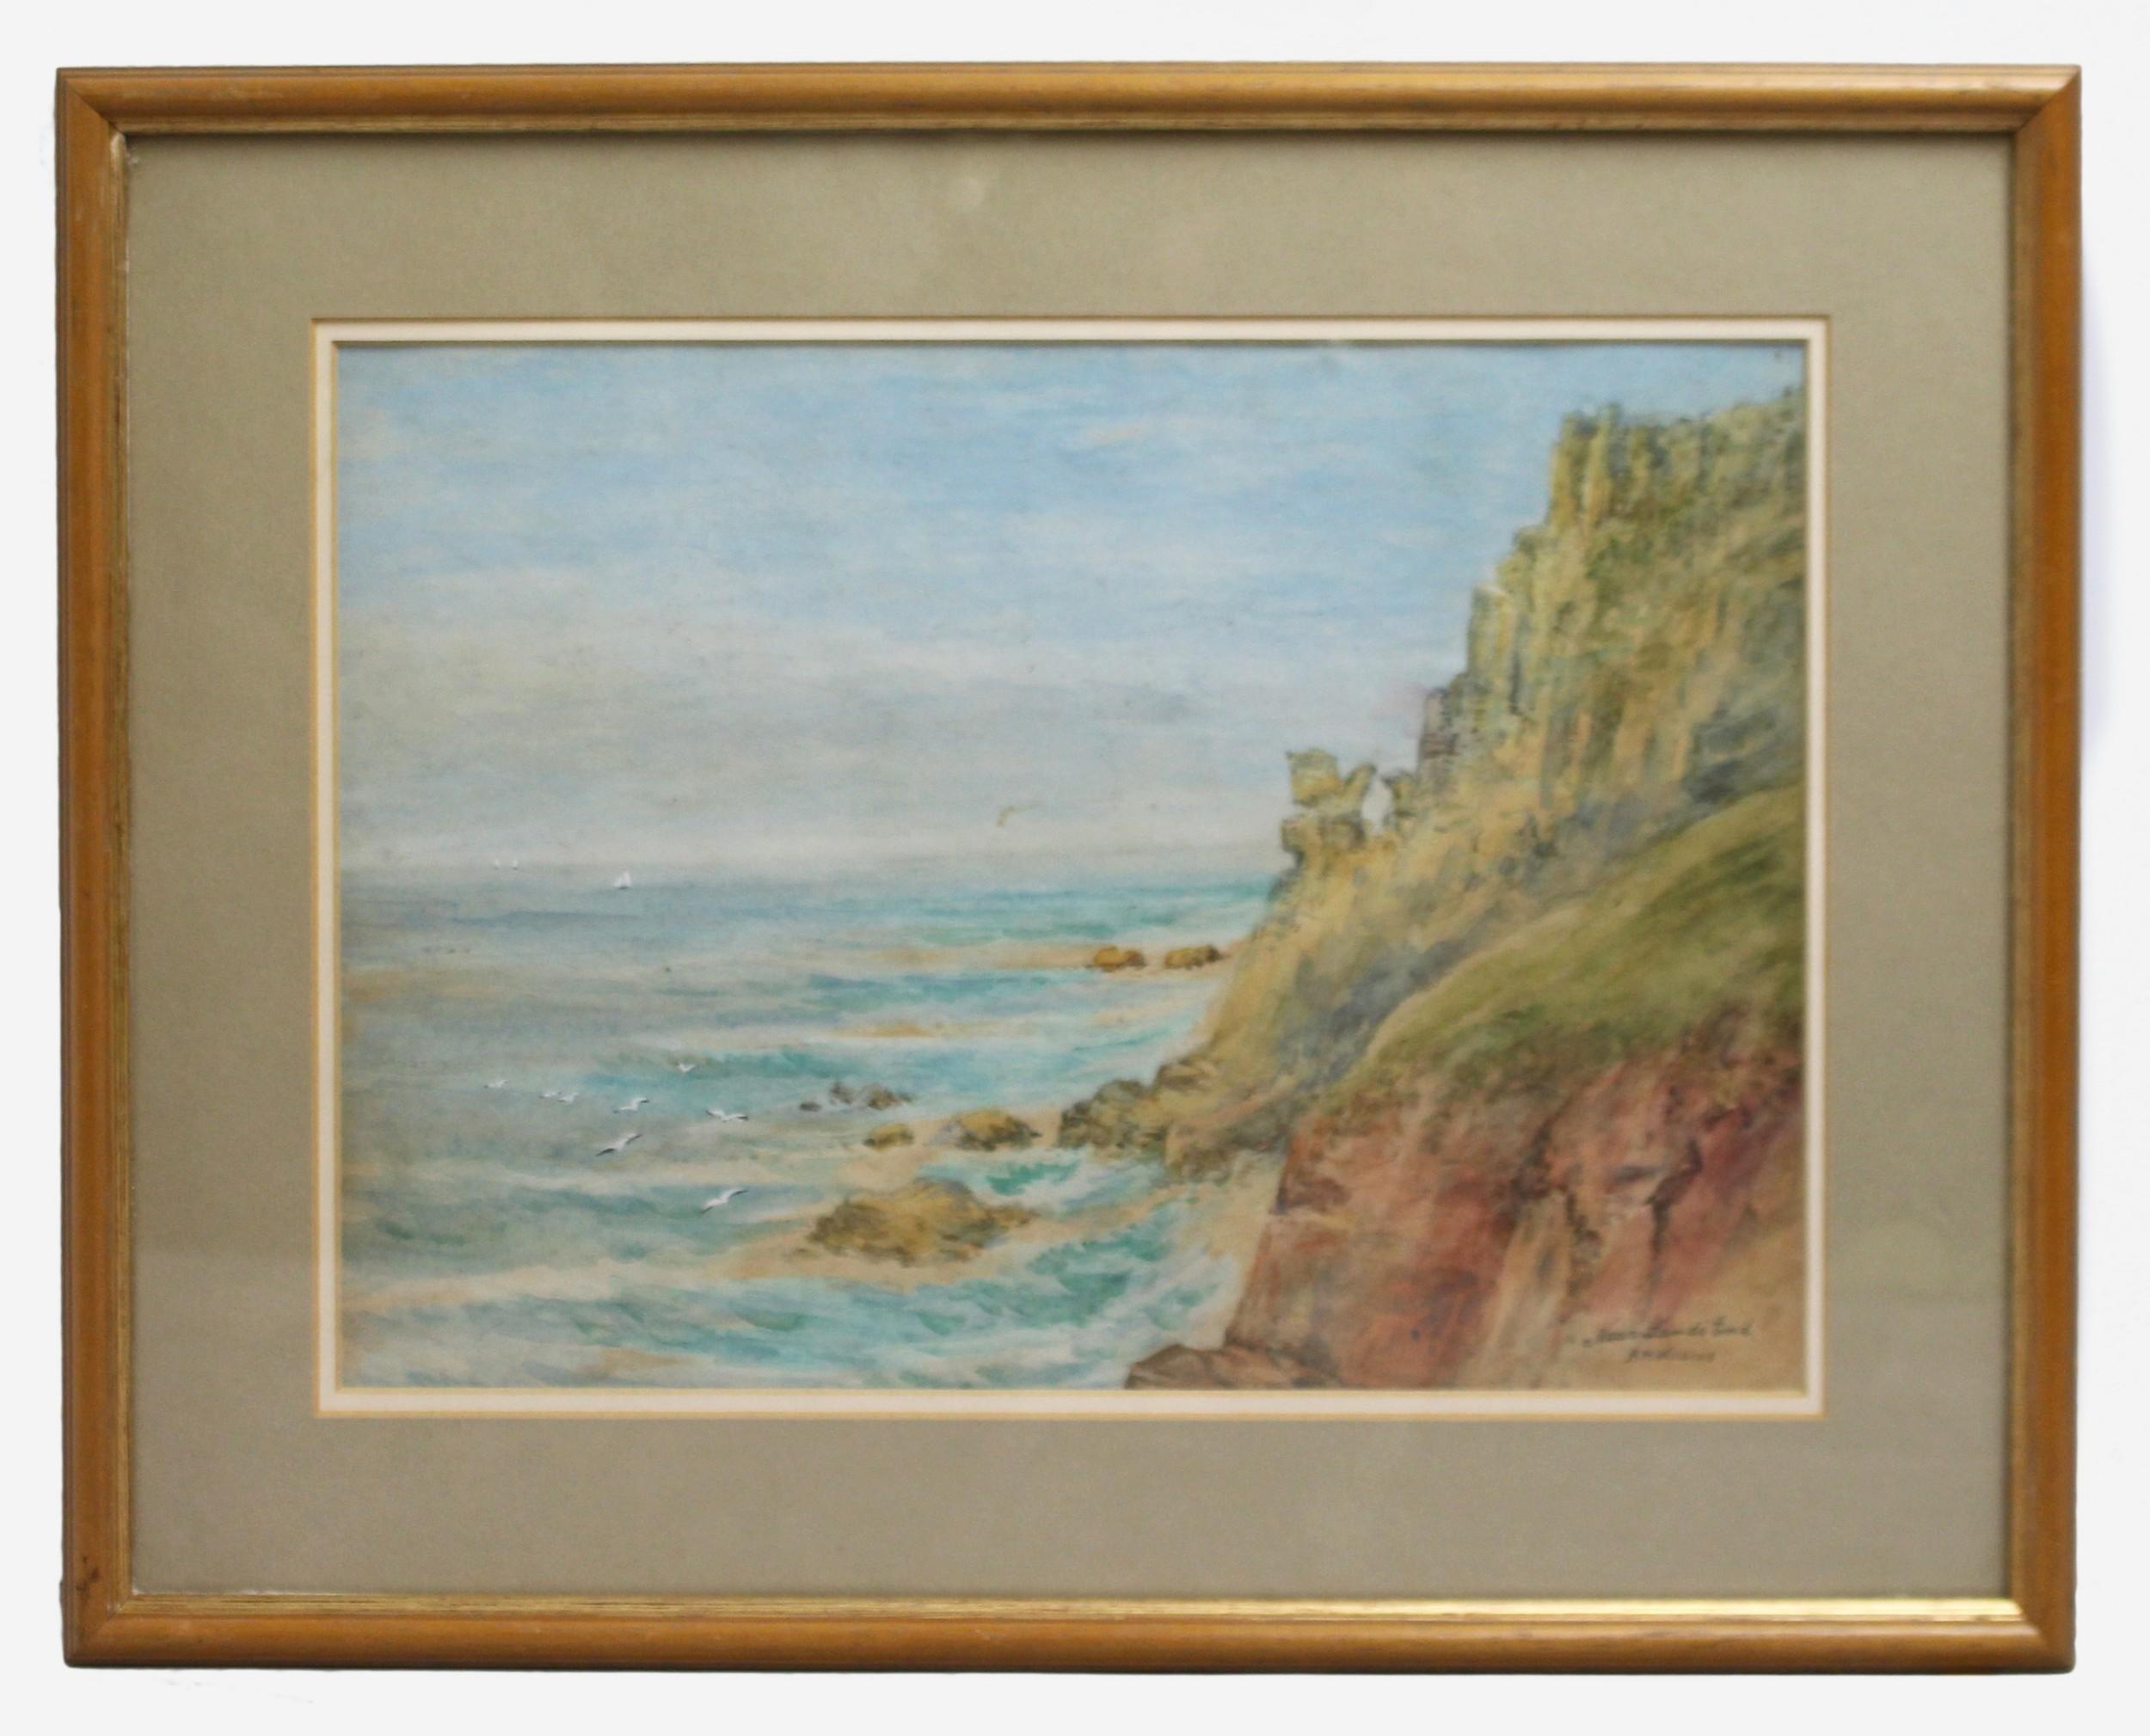 'near land's end' amwilkins watercolour